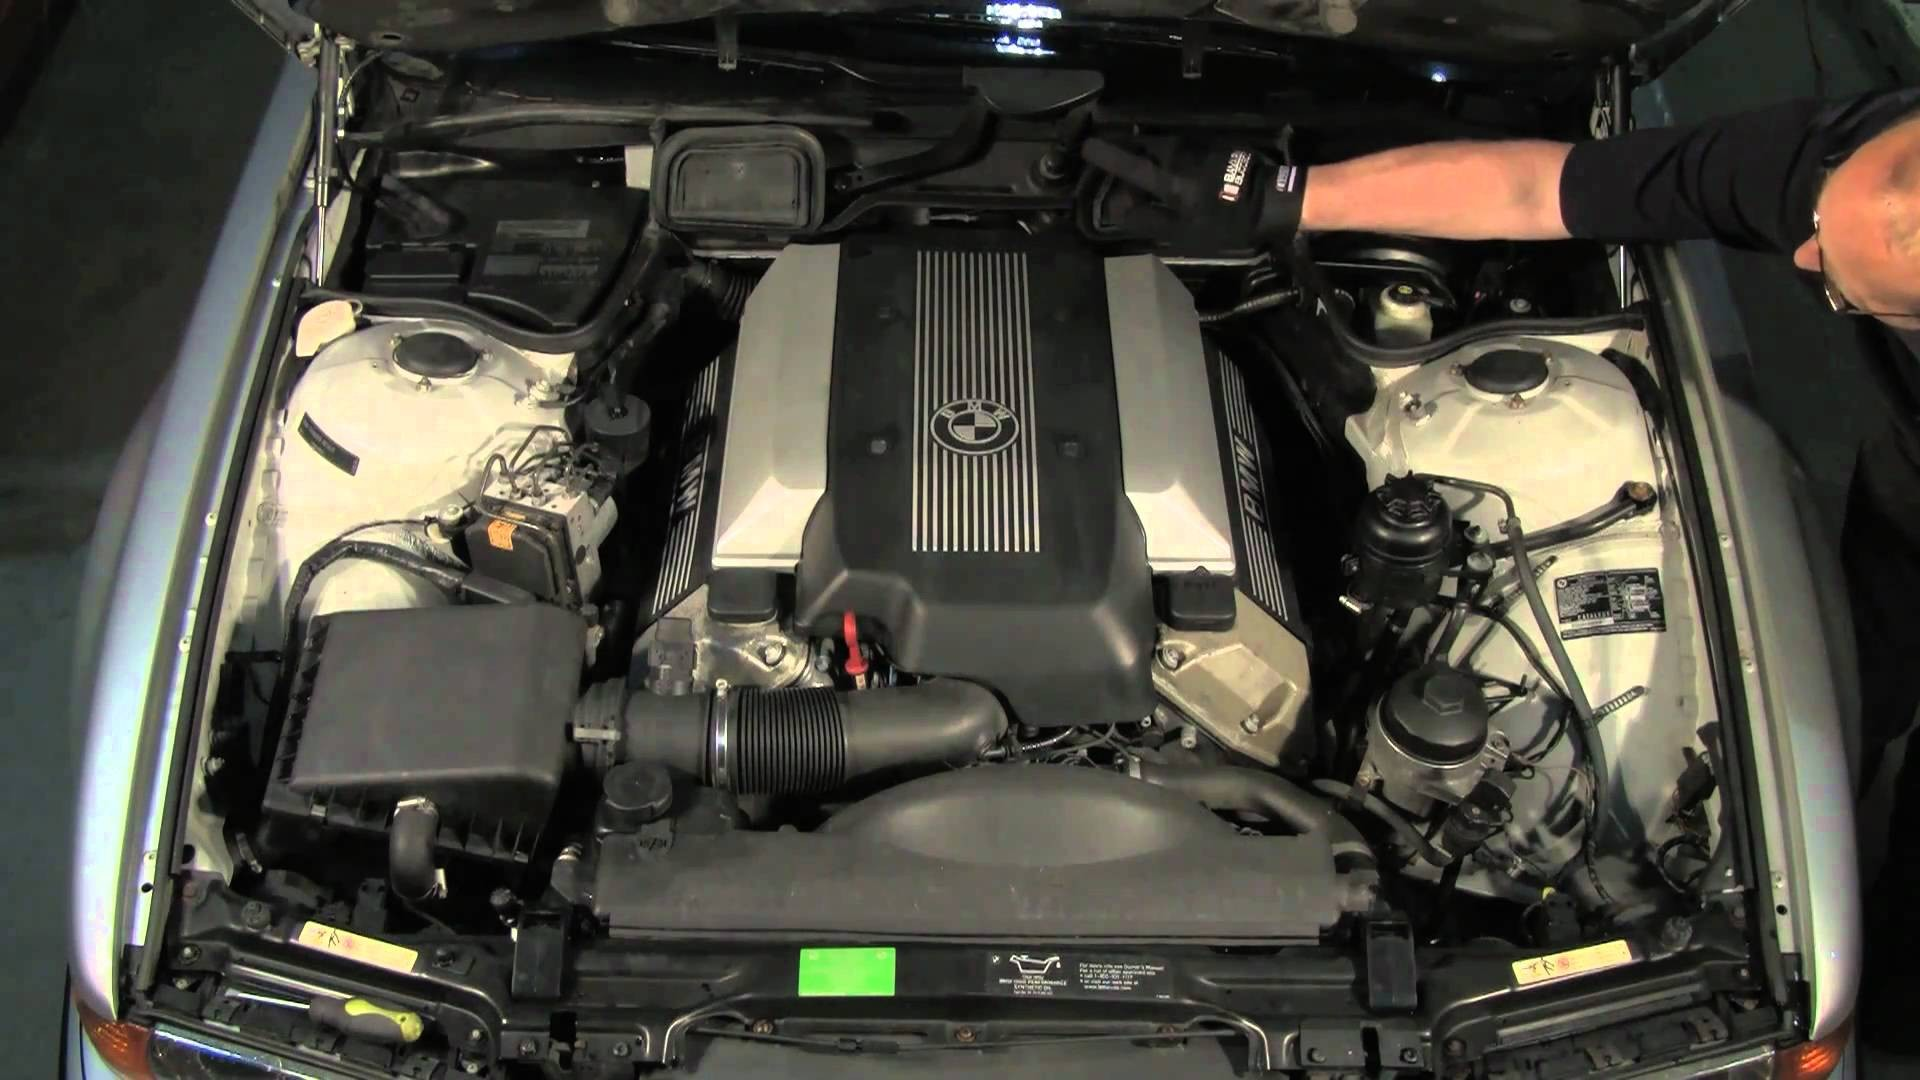 2001 bmw 740il engine diagram under the hood a bmw 7 series 95 thru rh detoxicrecenze com BMW 850I V12 Engine 1993 BMW 325I Engine Diagram